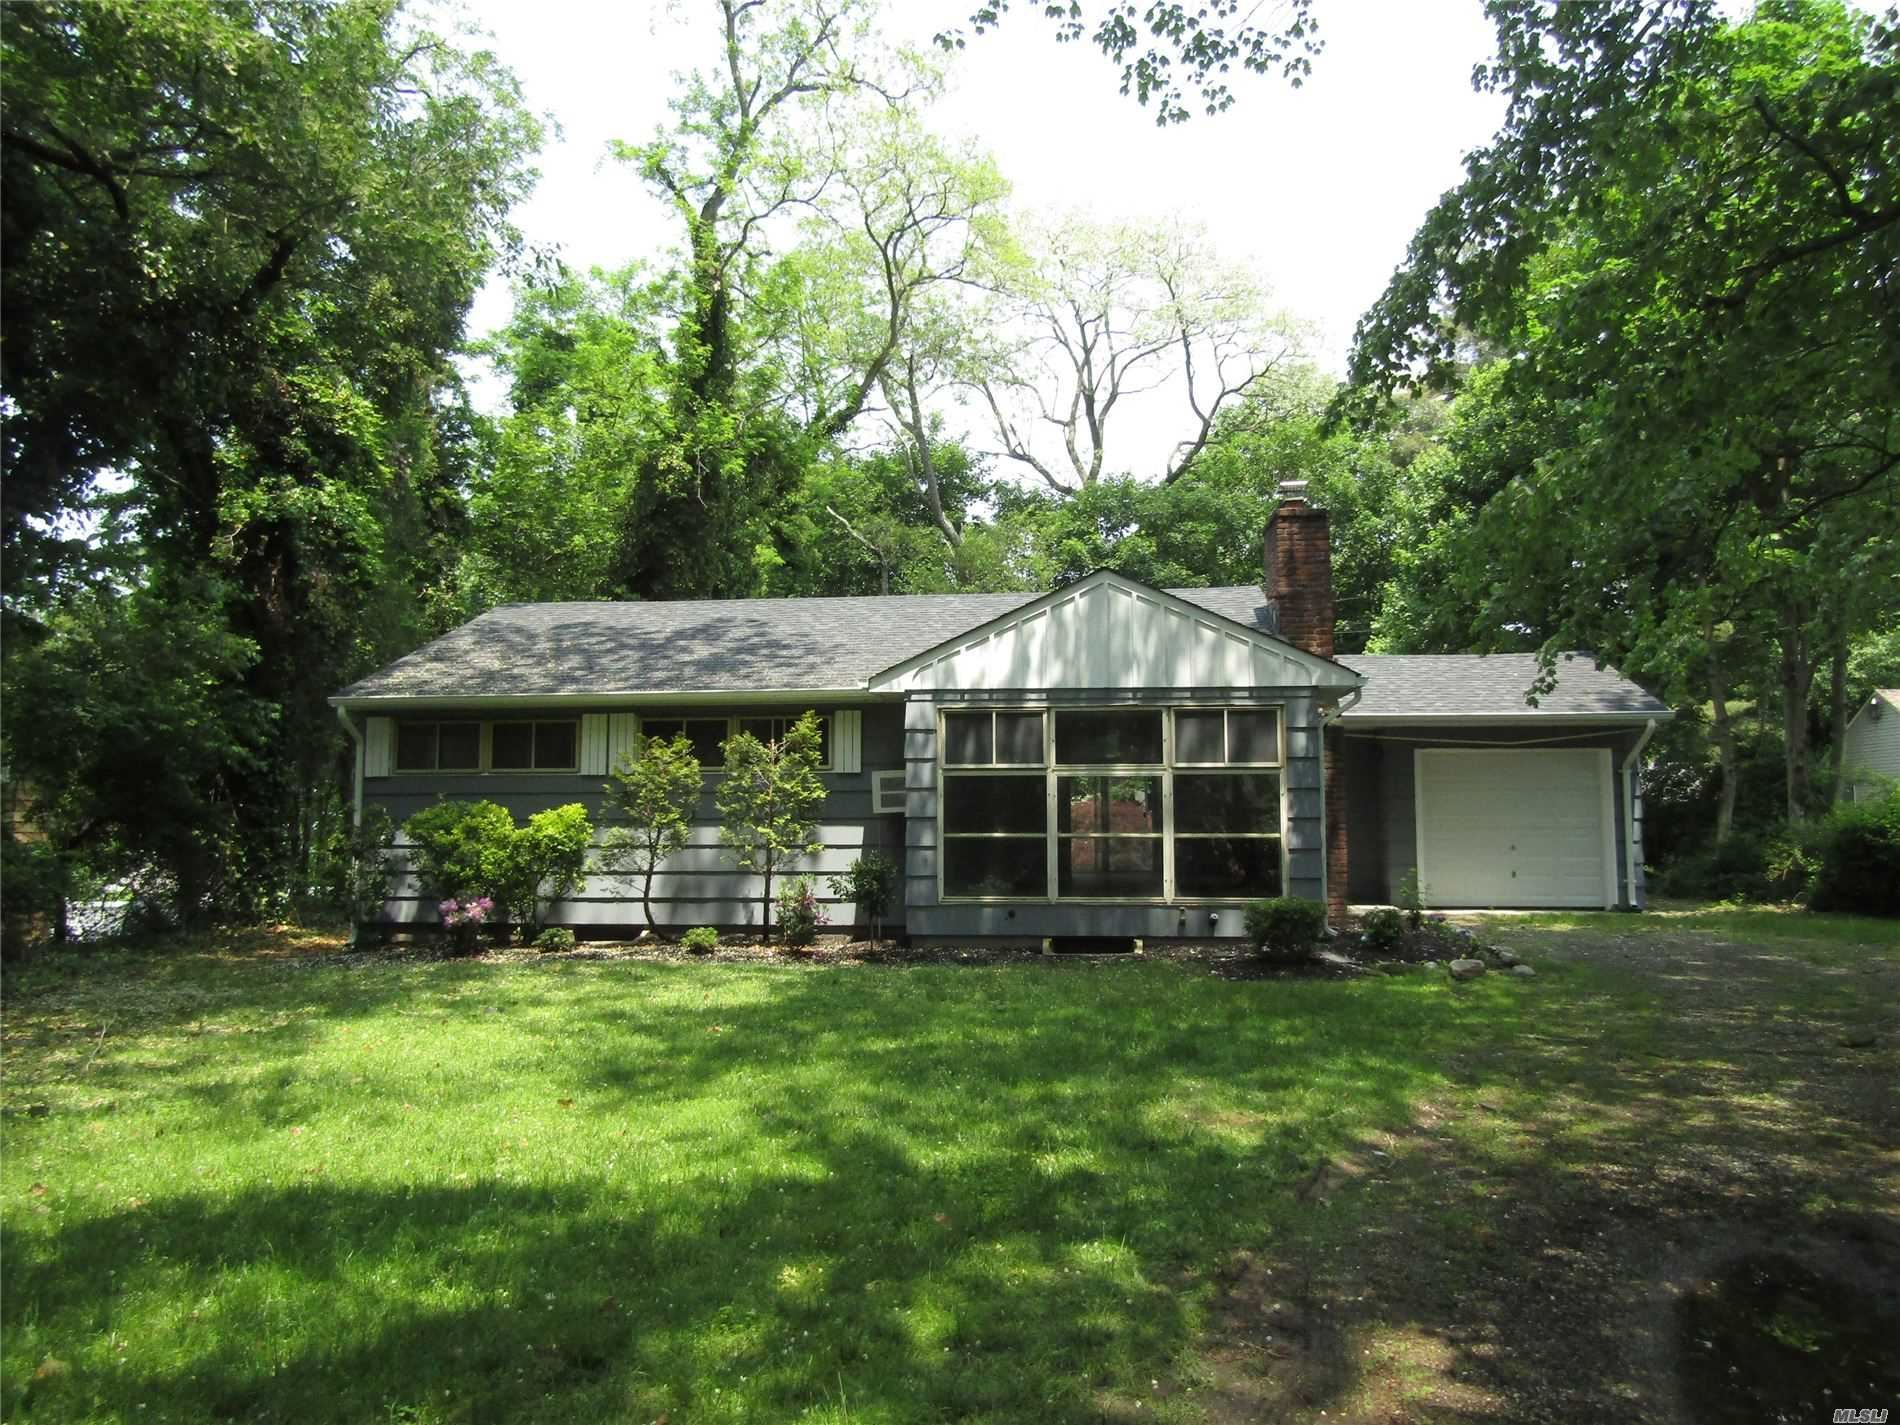 55 Cedar Dr, Huntington, NY 11743 - MLS#: 3230404